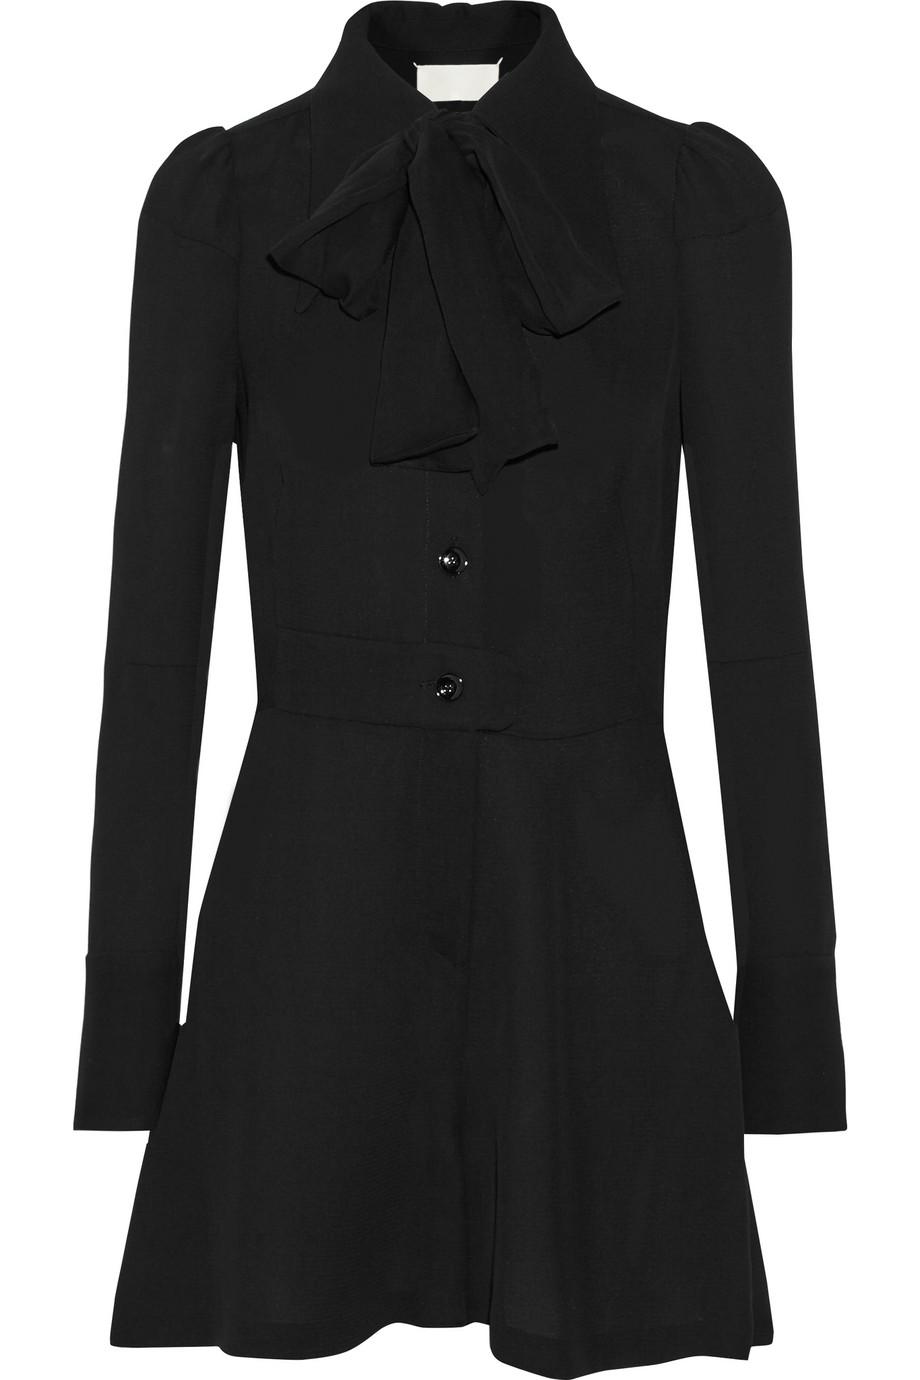 Maison Margiela Pussy-Bow Crepe Playsuit, Black, Women's, Size: 36